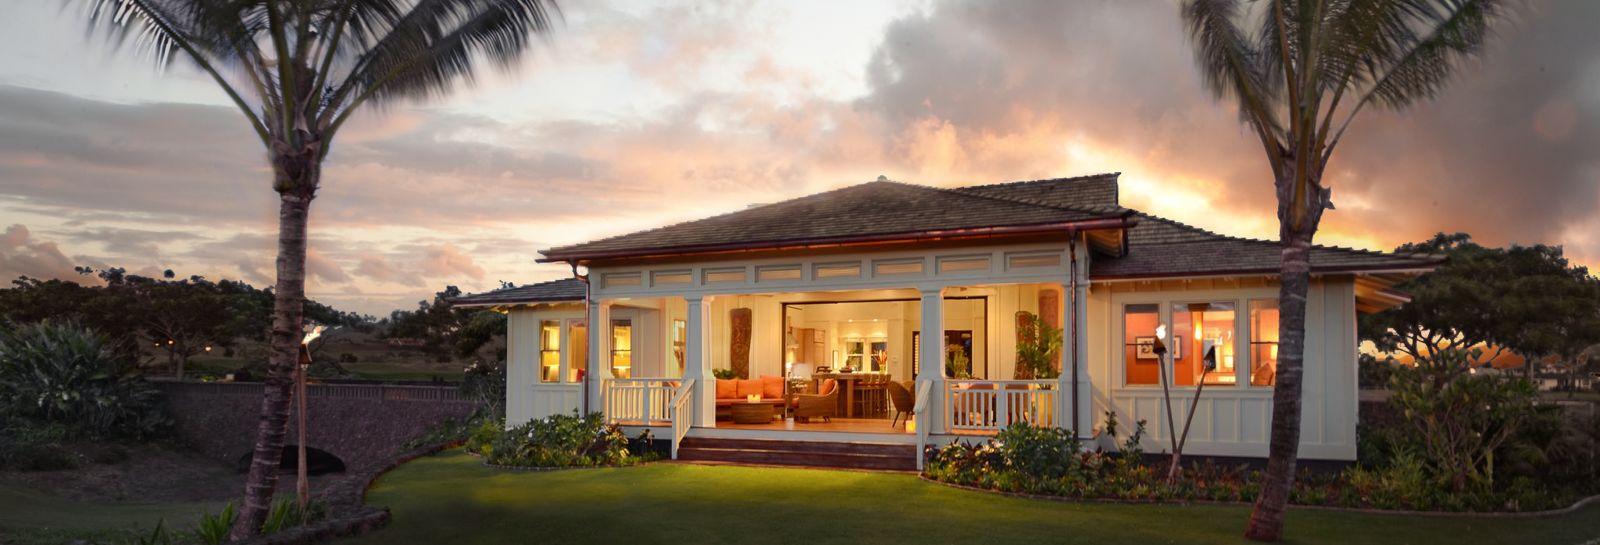 Kauai Club Bungalow